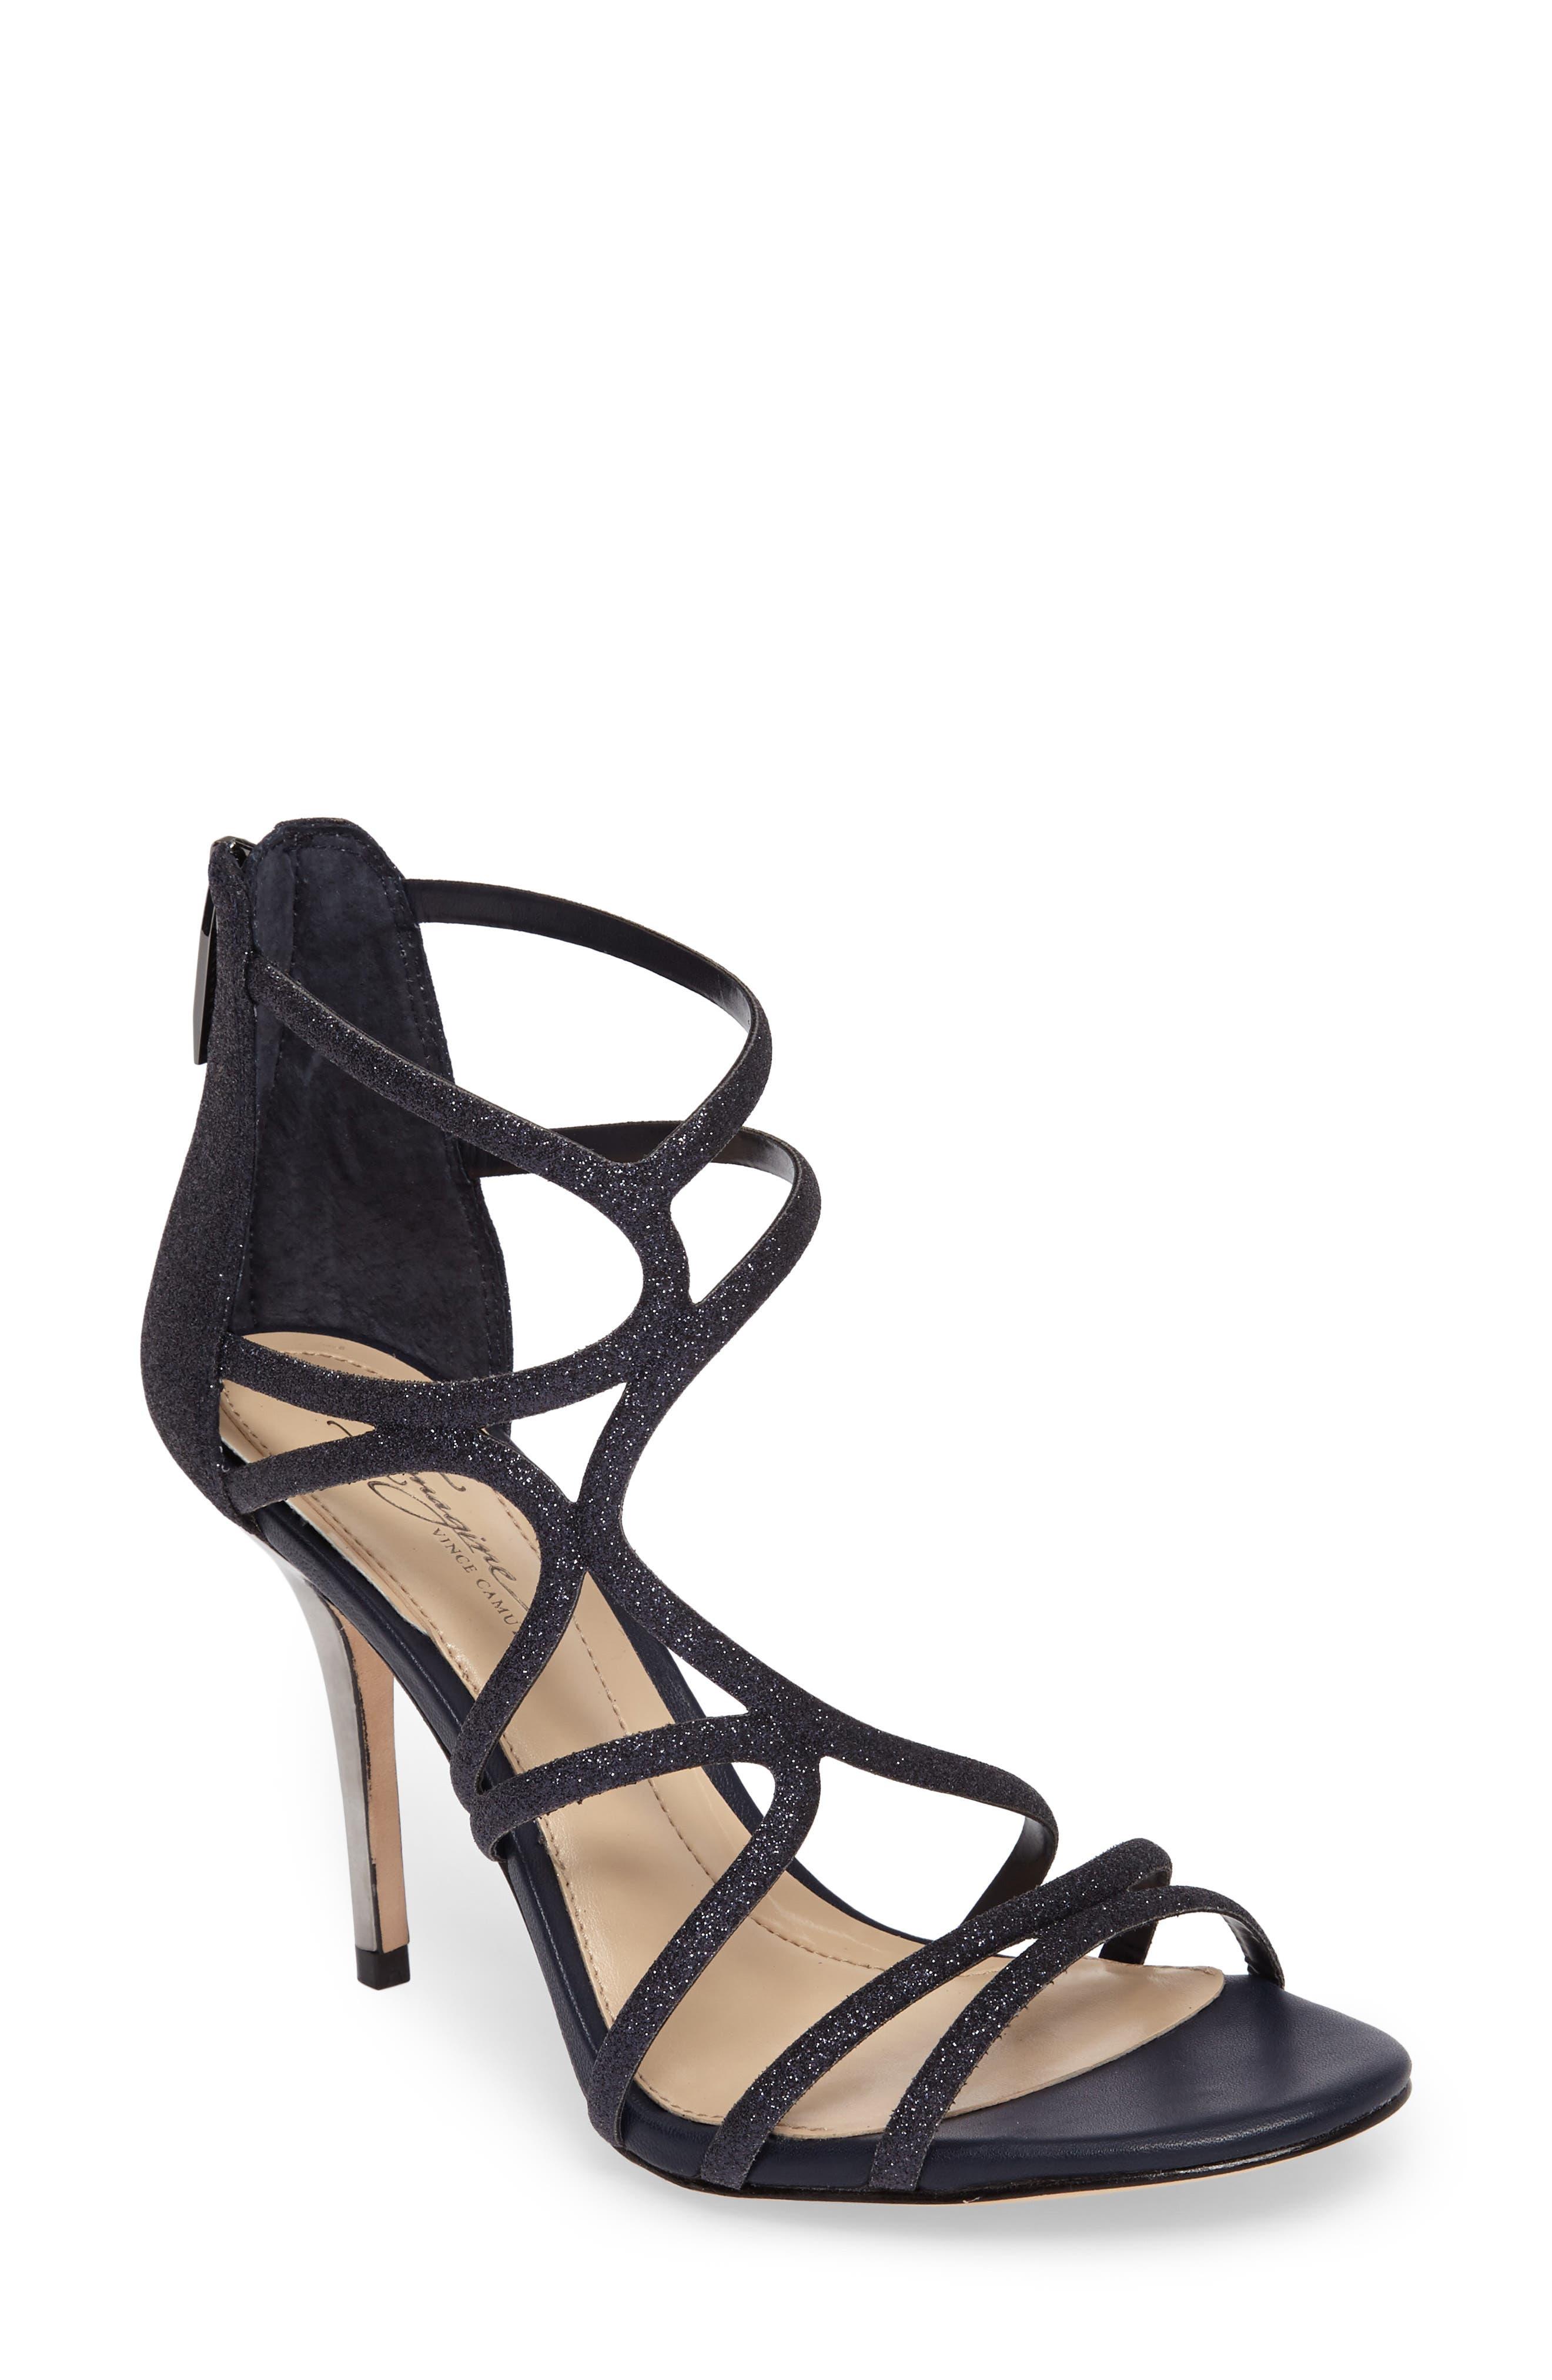 'Ranee' Dress Sandal,                             Main thumbnail 5, color,